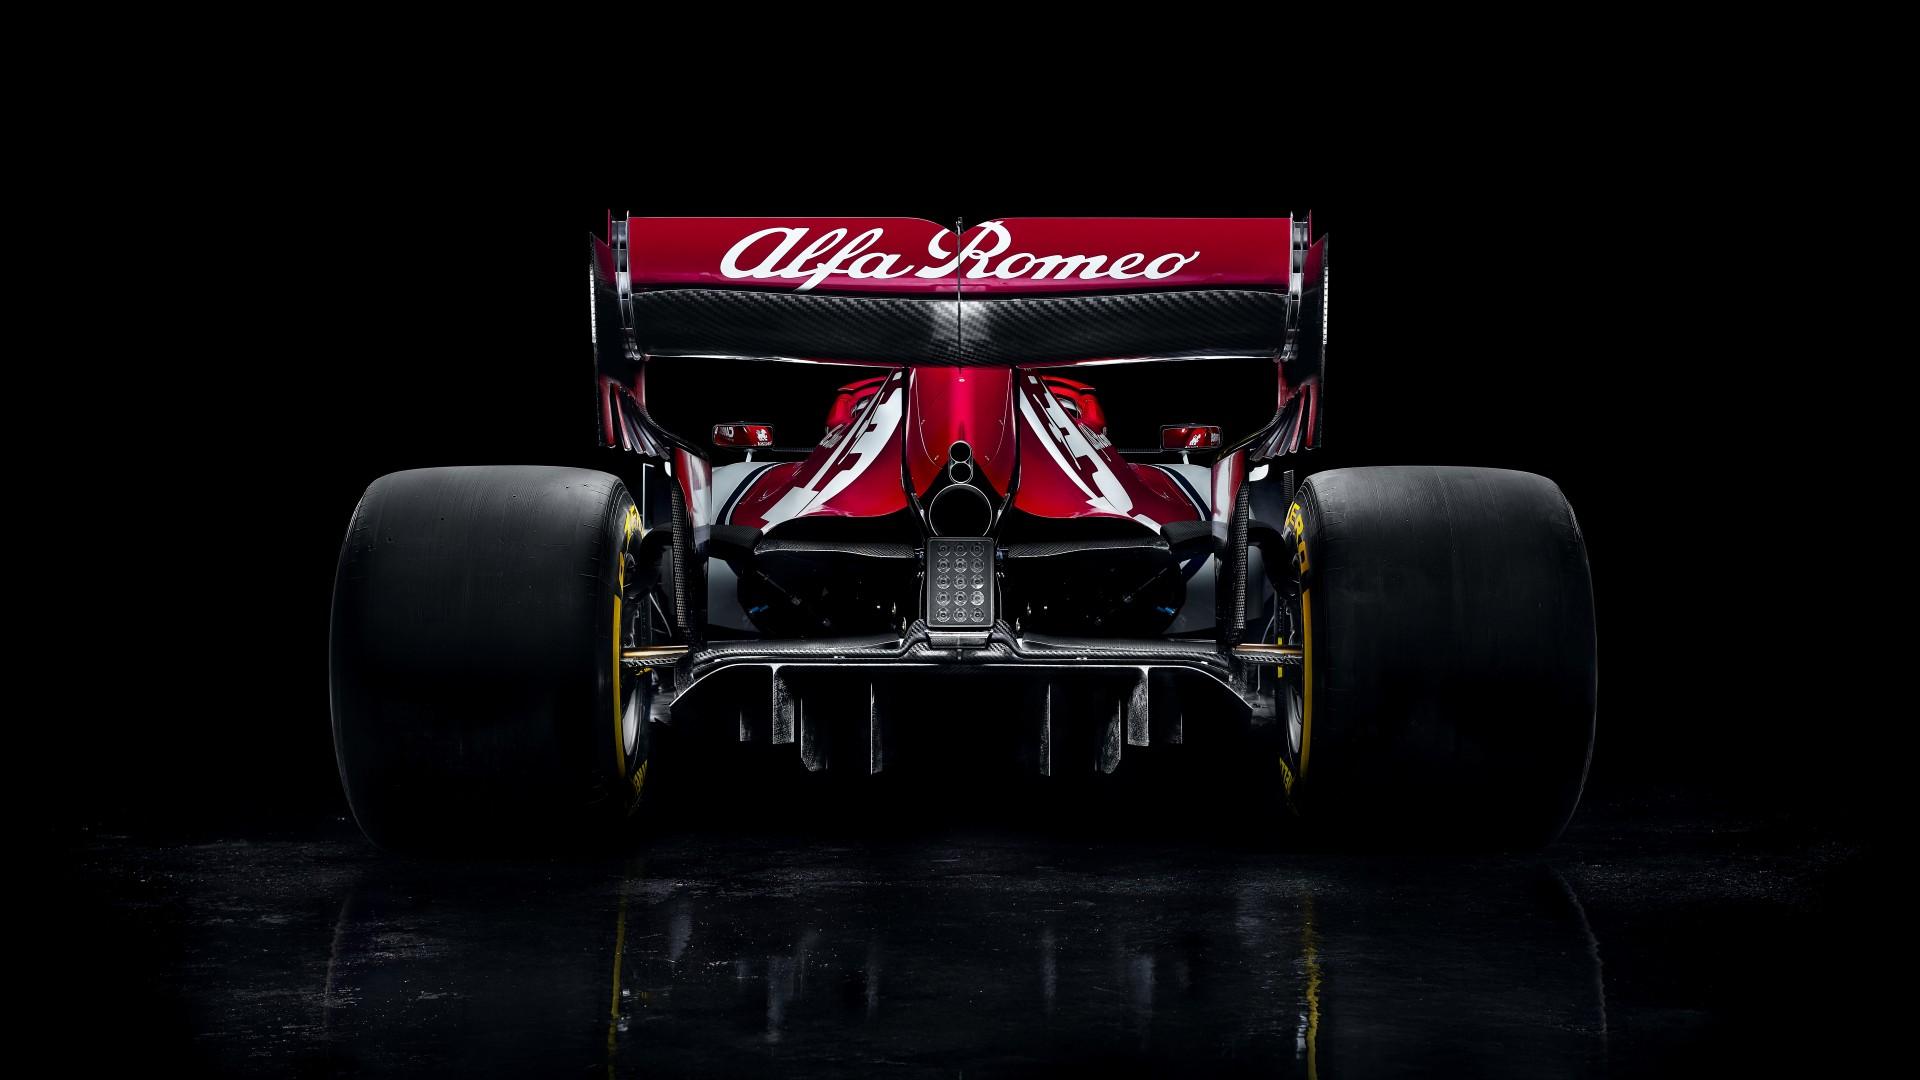 Hummer Car Wallpapers Hd Download Alfa Romeo C38 Formula 1 2019 4k 8k Wallpaper Hd Car